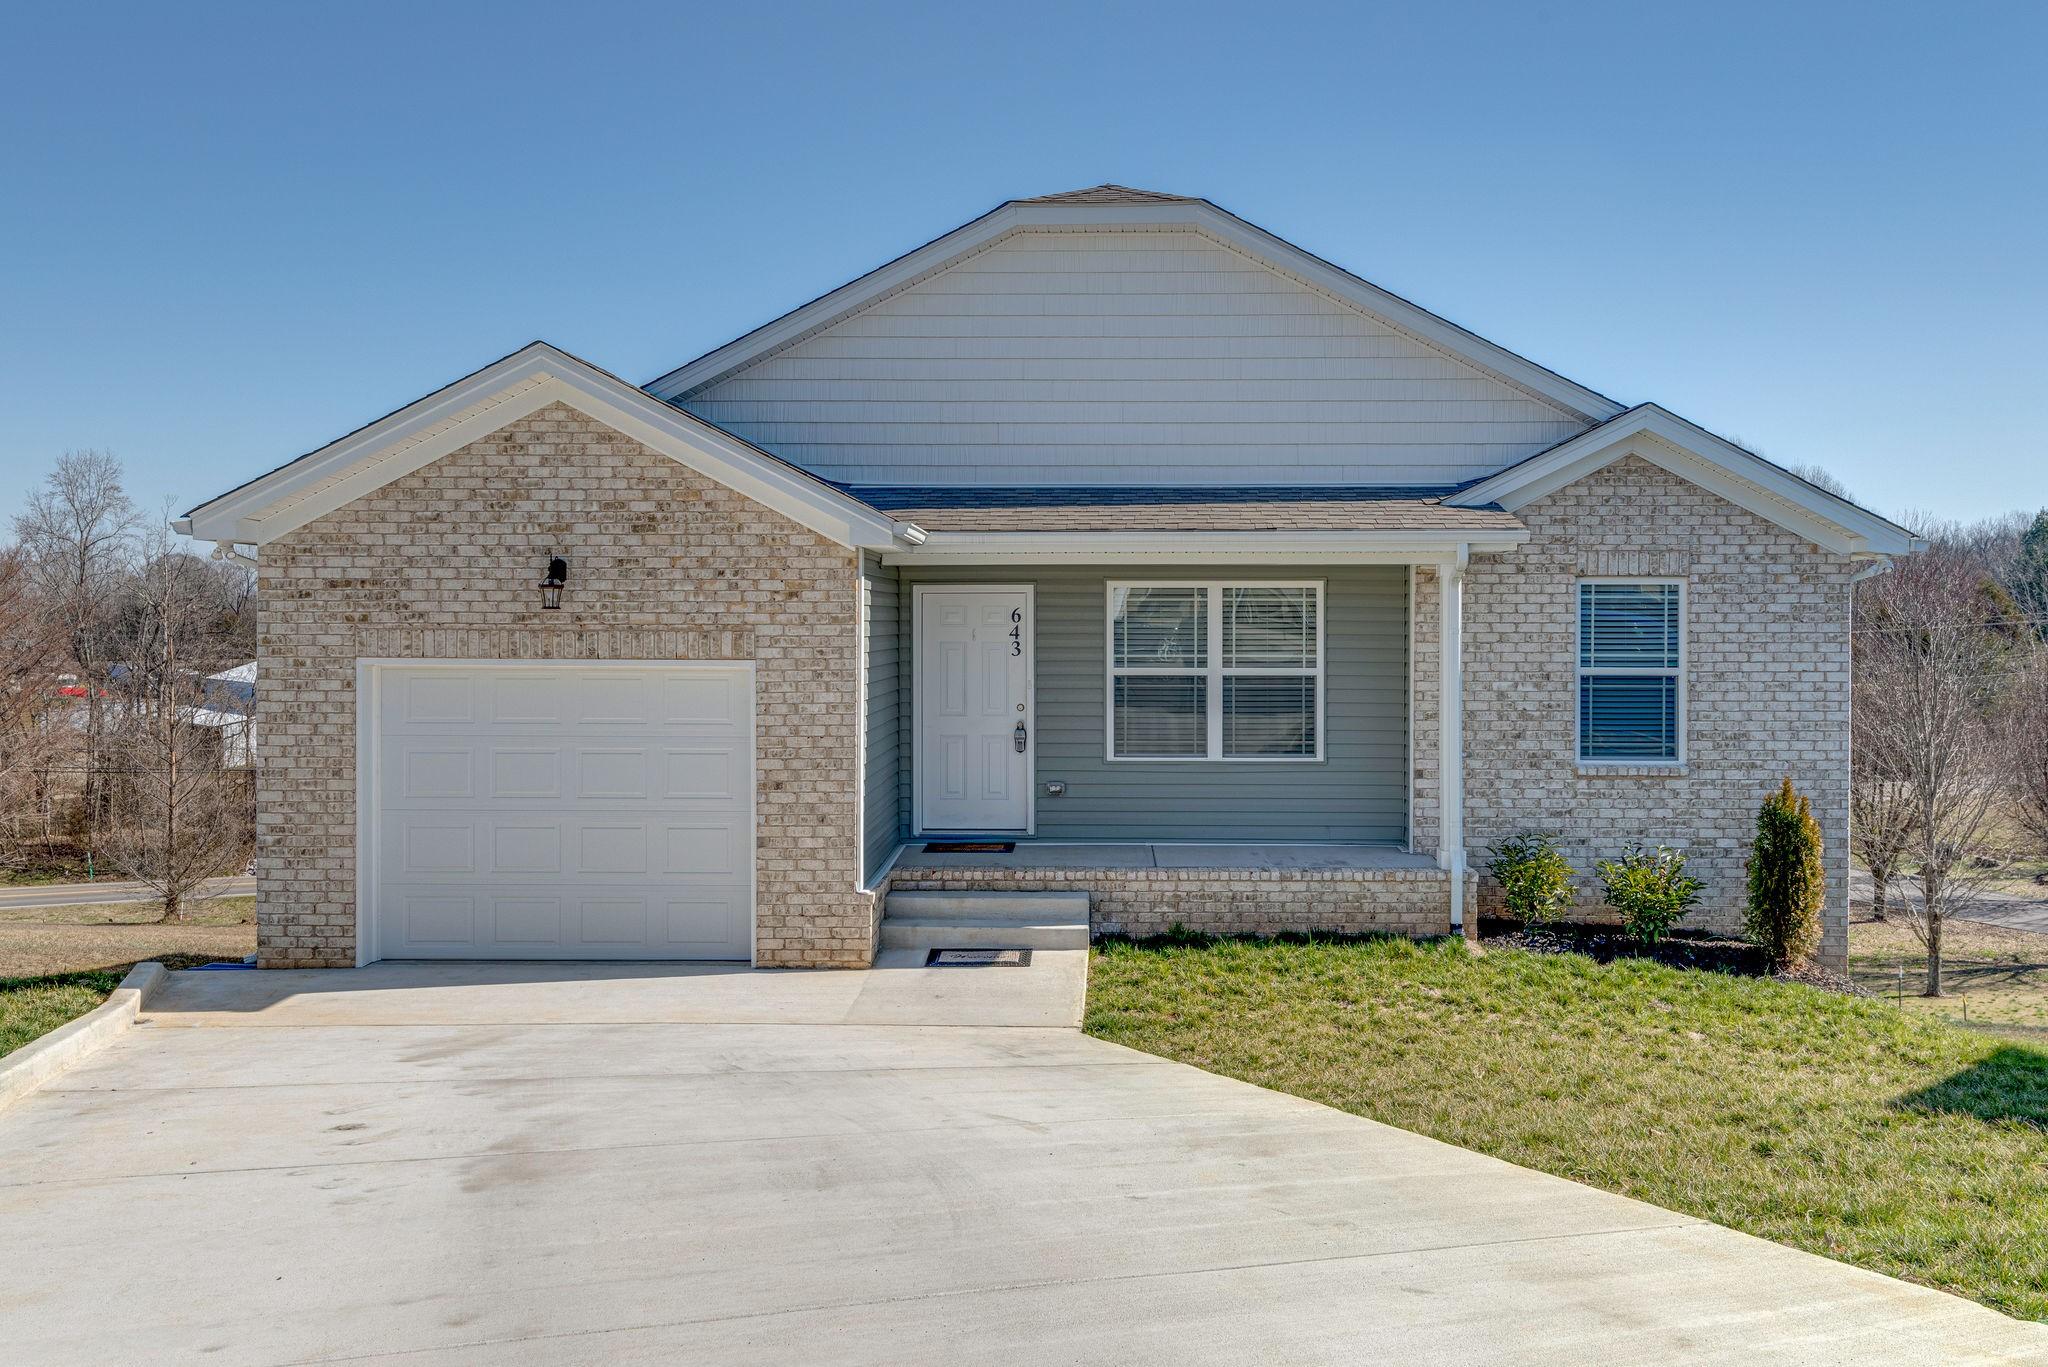 643 Berry Cir, Springfield, TN 37172 - Springfield, TN real estate listing